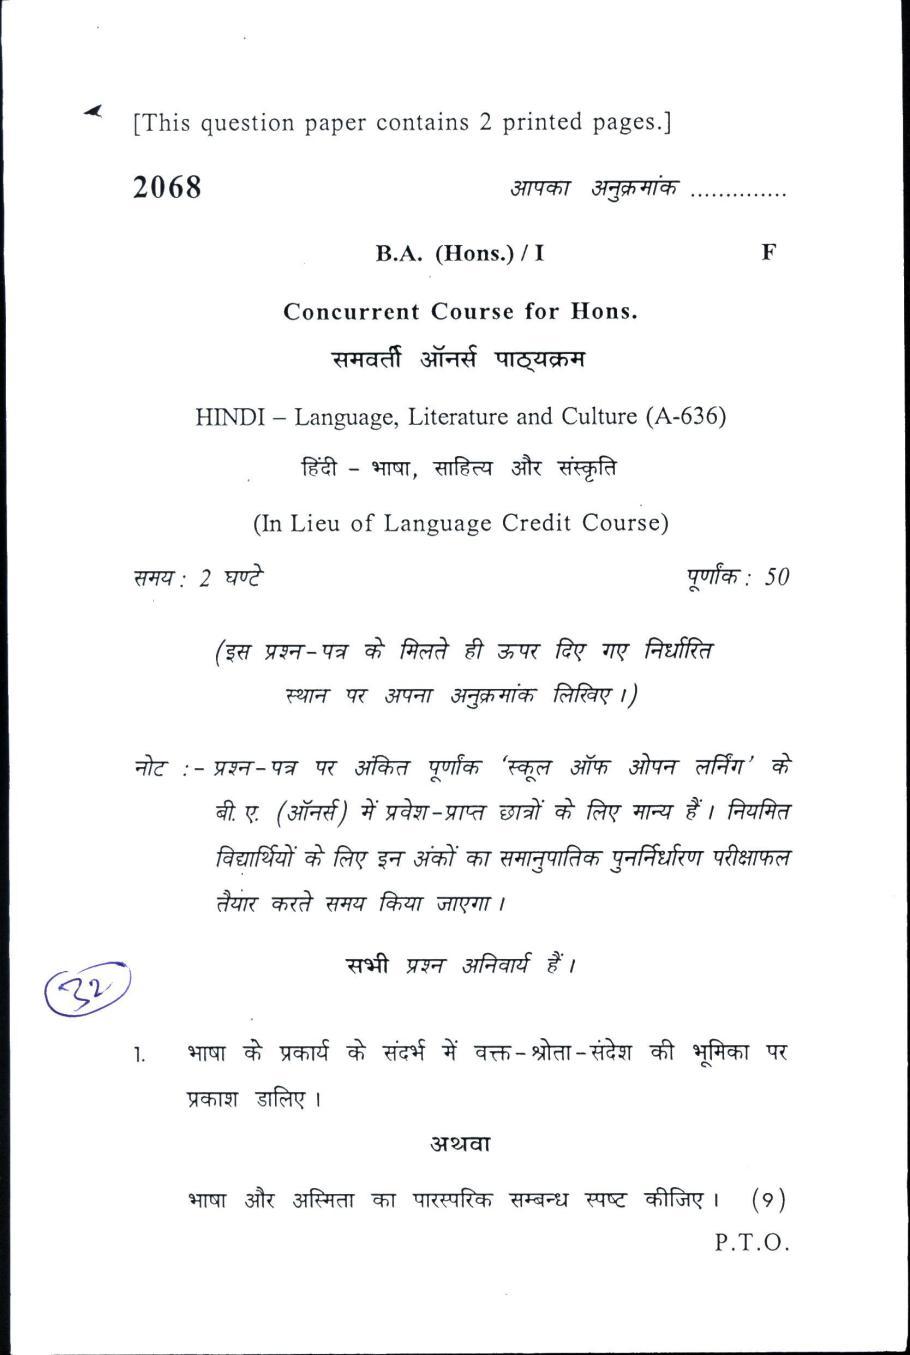 DU SOL Question Paper 2017 BA (Hons.) Hindi Language, Literature and Culture - Page 1